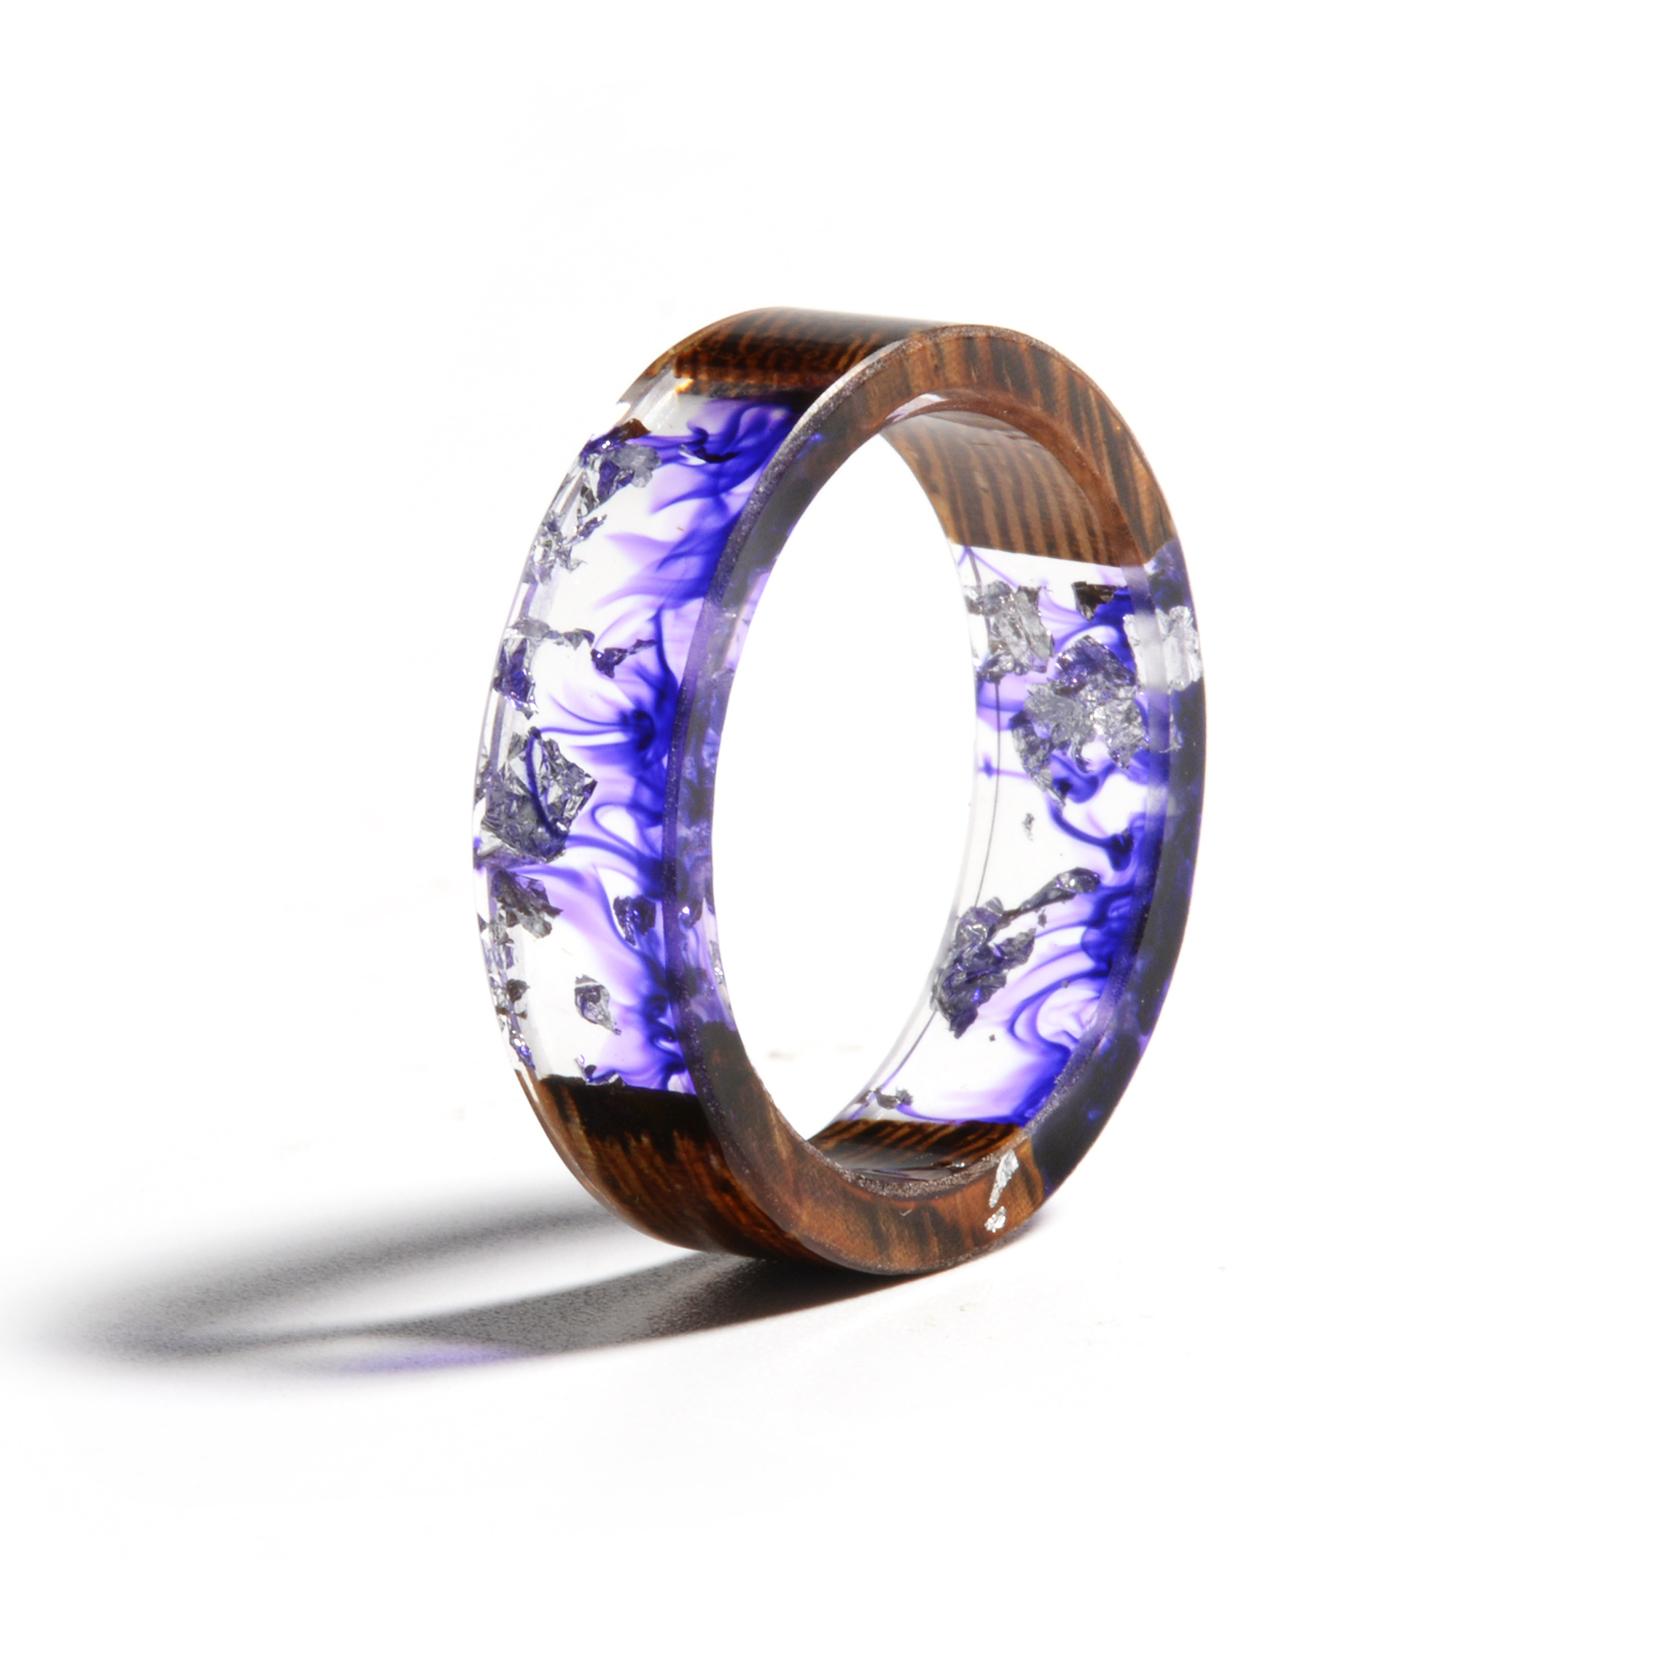 Clear Wood Resin Ring Handmade Dried Flower Hand Jewellery 15